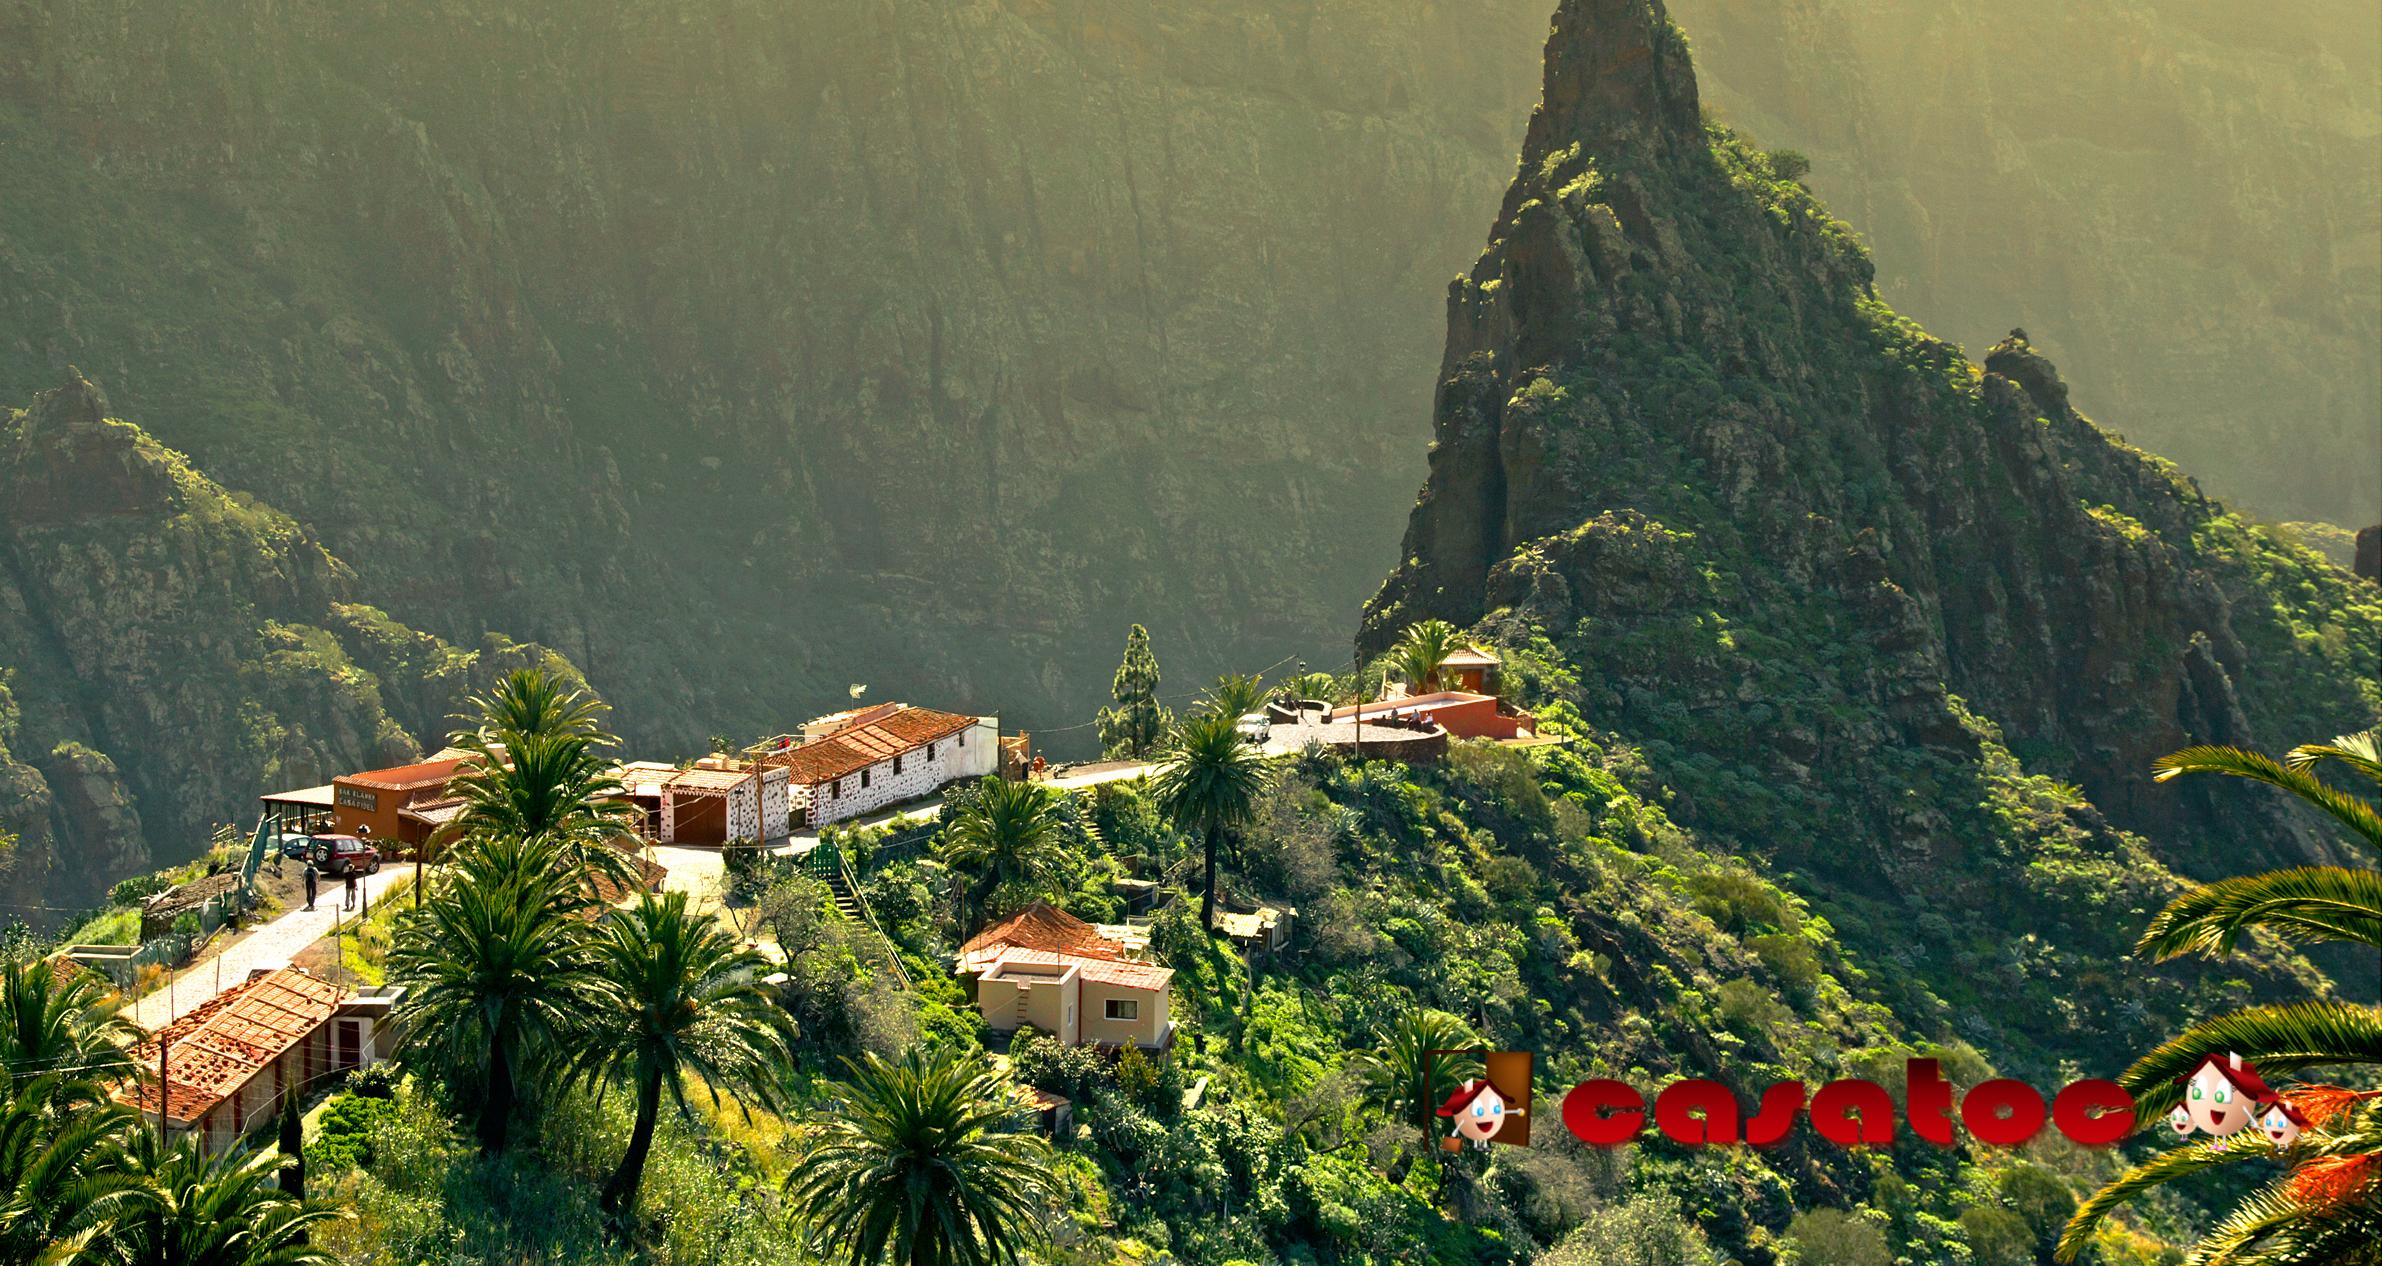 Turismo rural en Tenerife